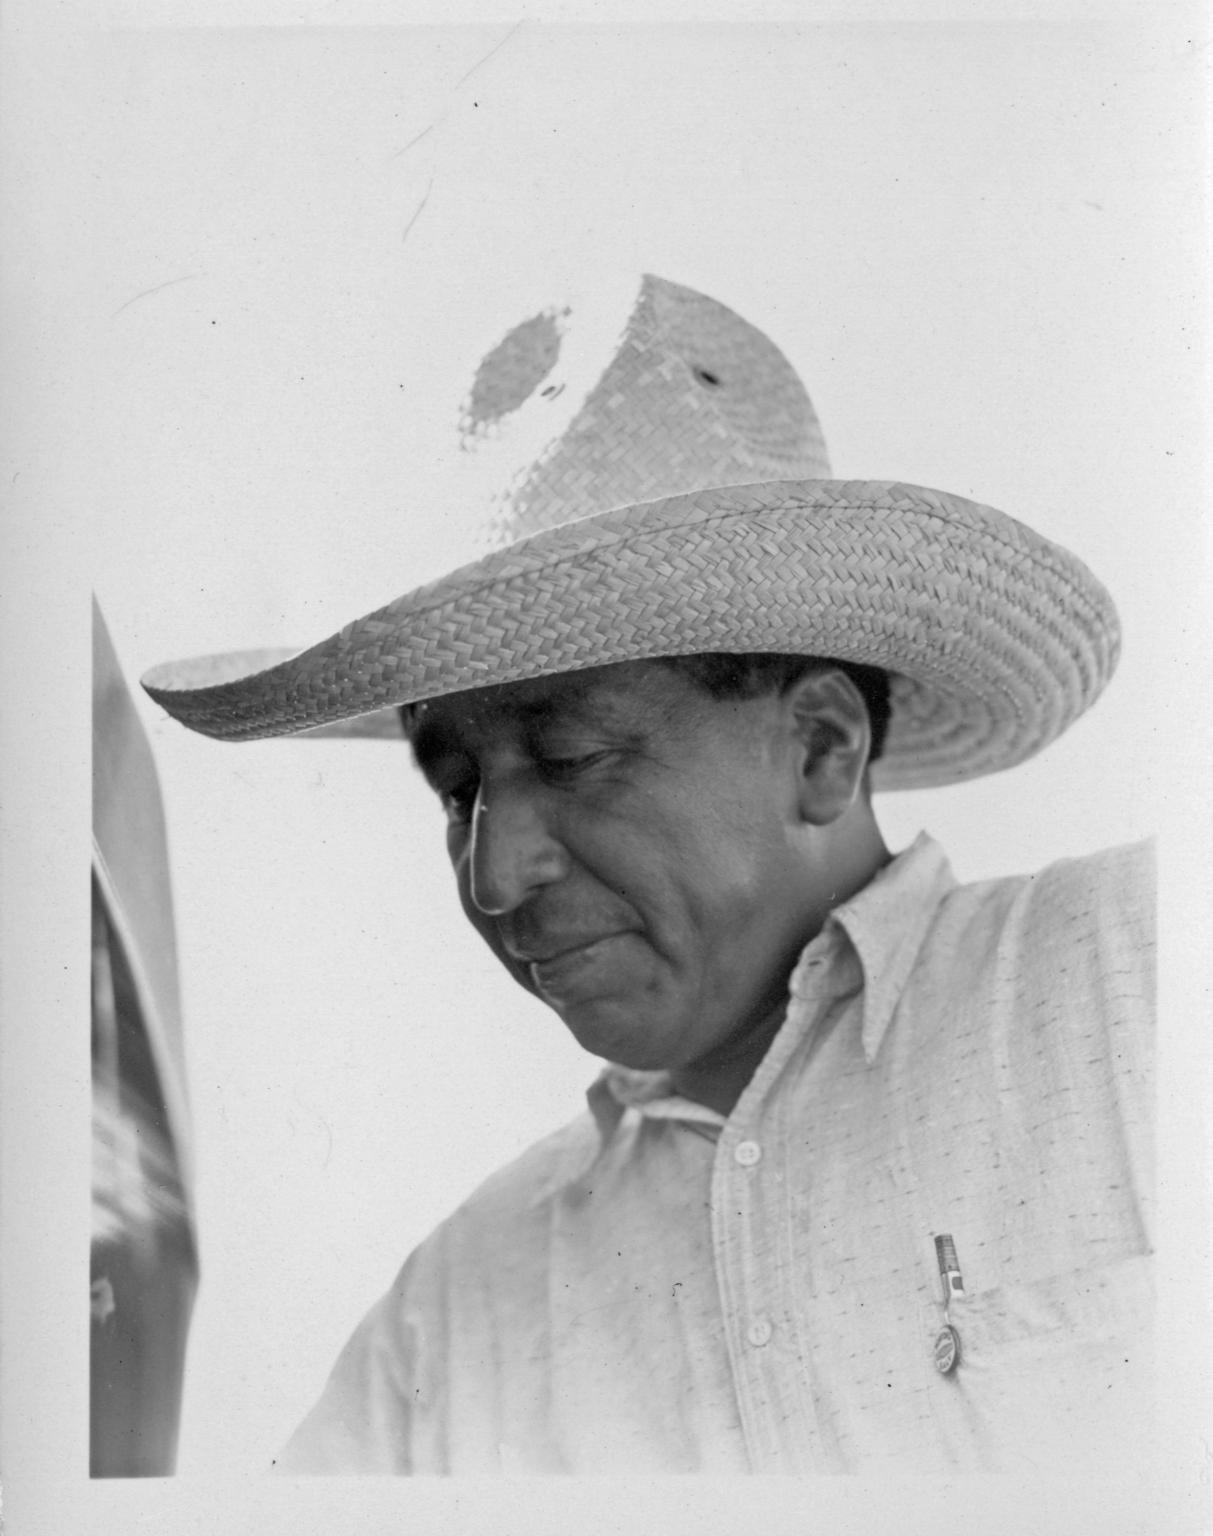 Joe Domingo